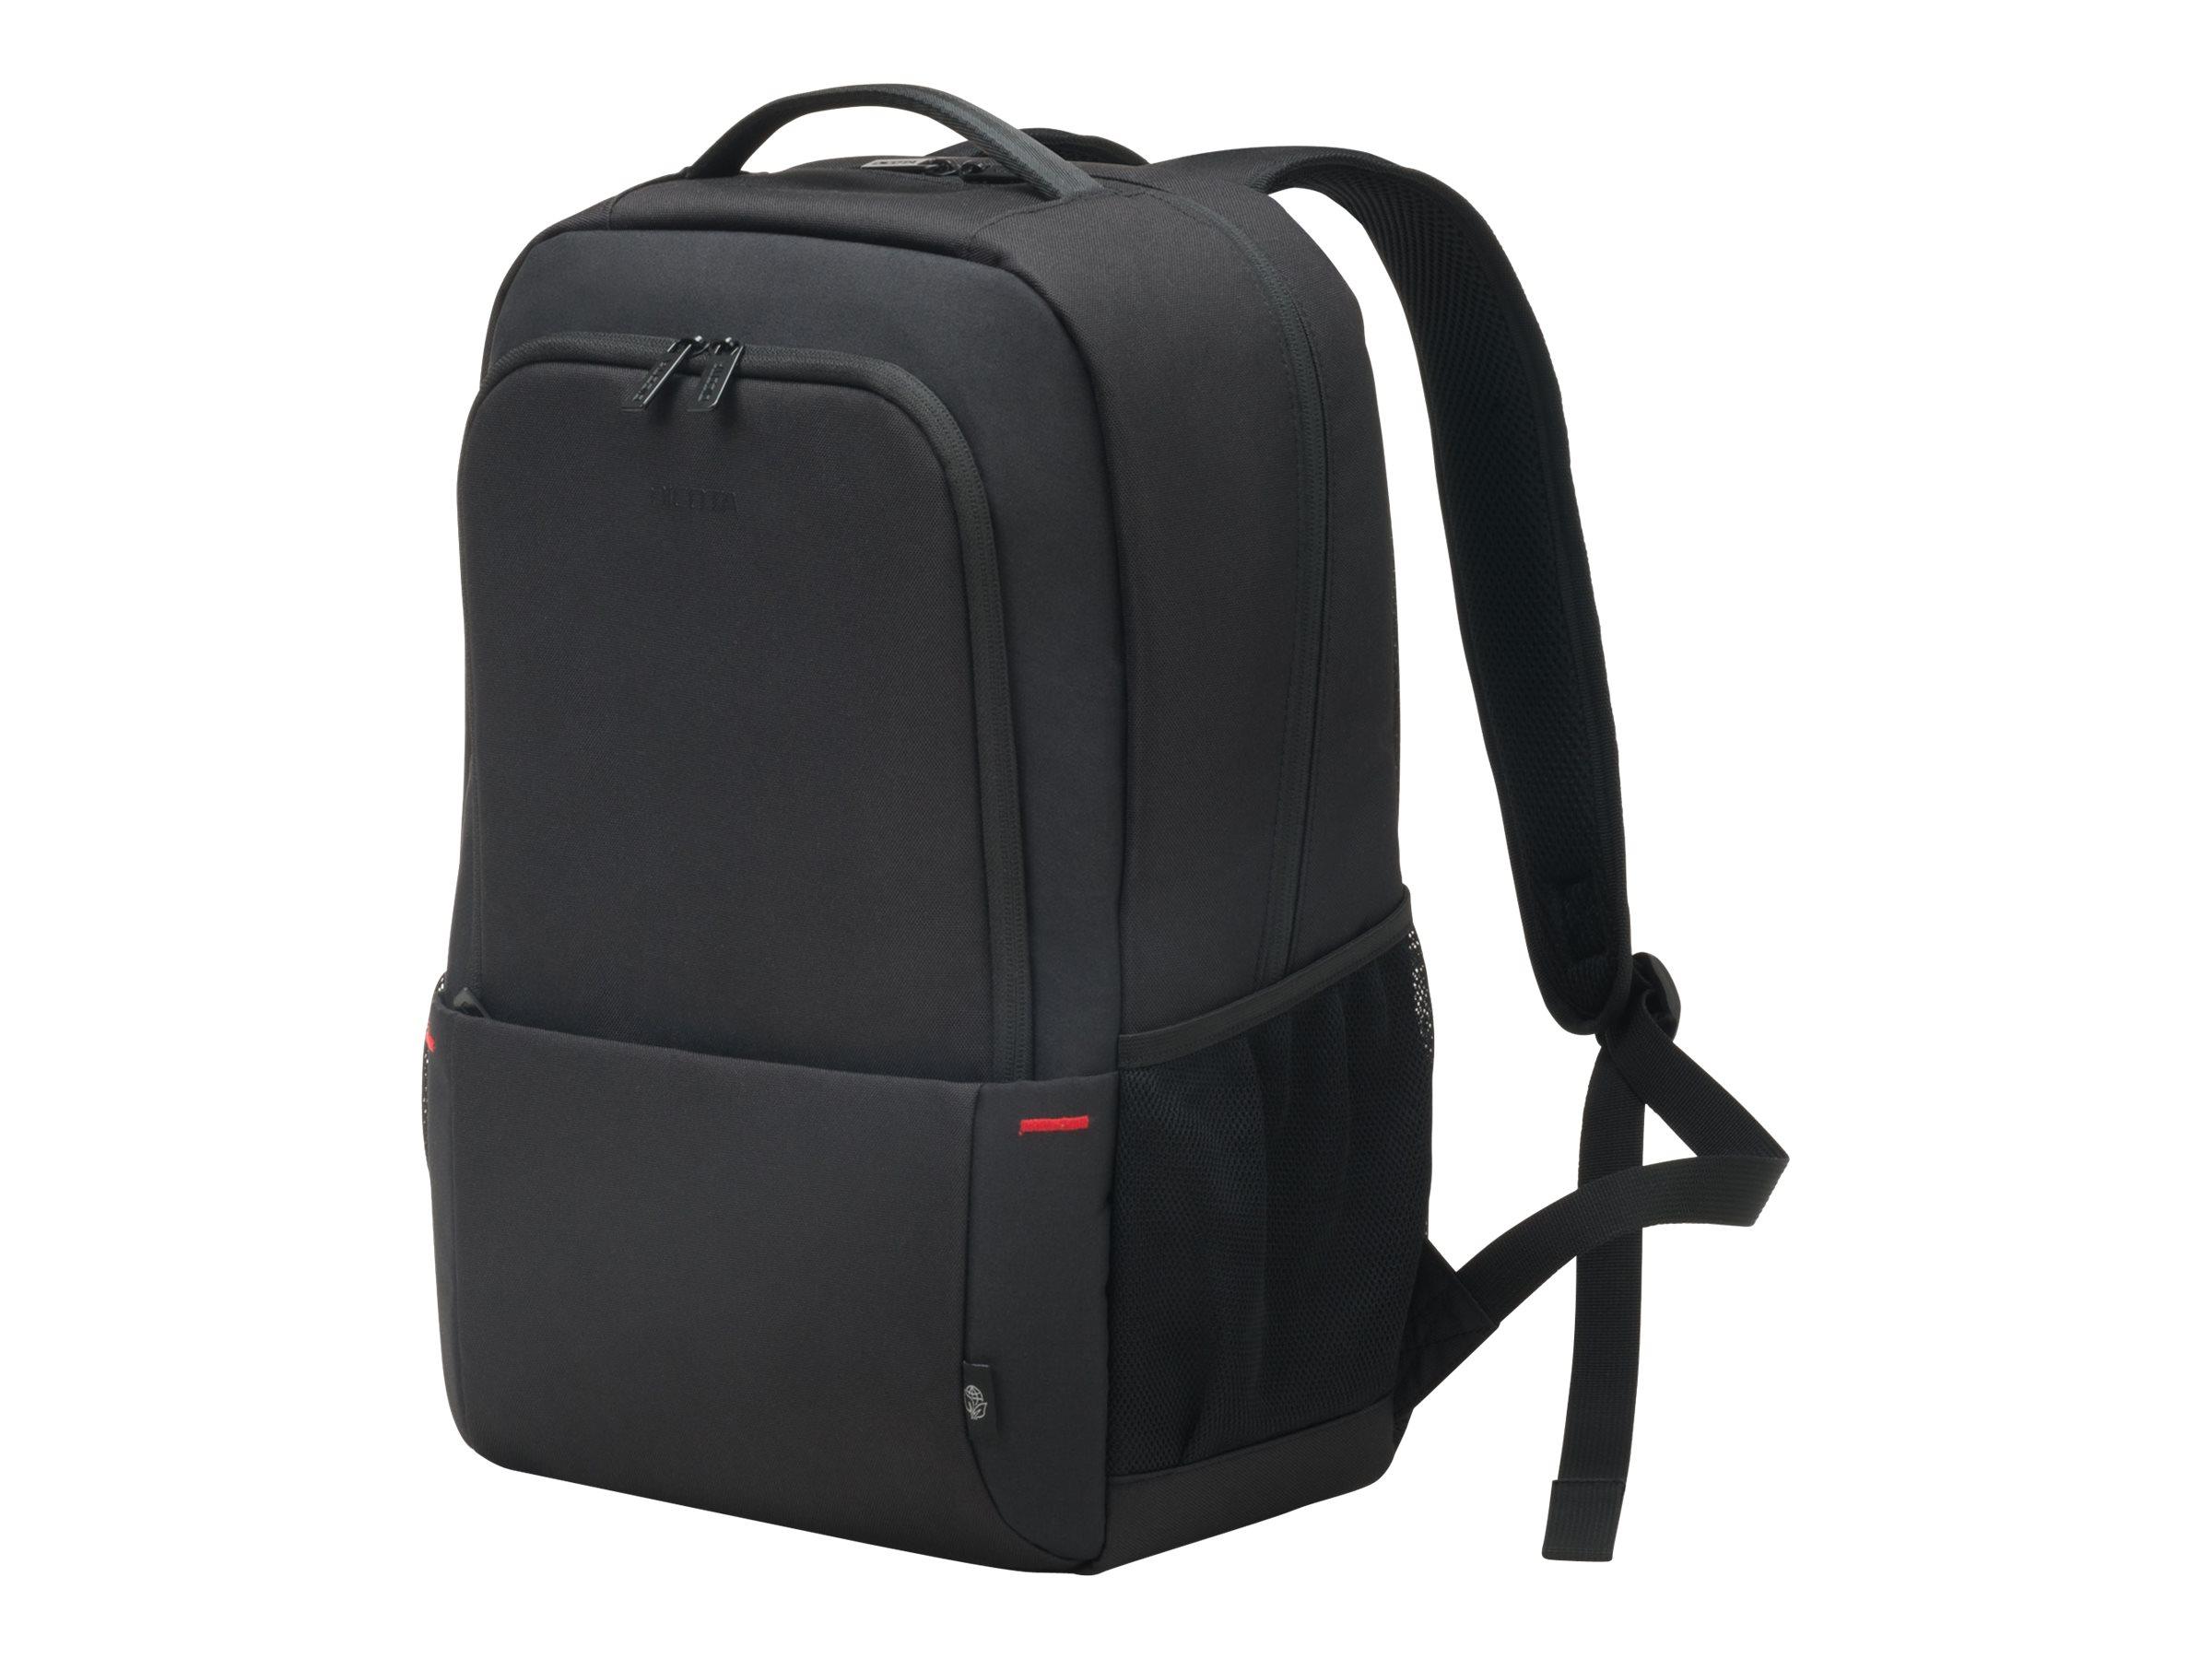 Vorschau: Dicota Eco Plus BASE - Notebook-Rucksack - 39.6 cm